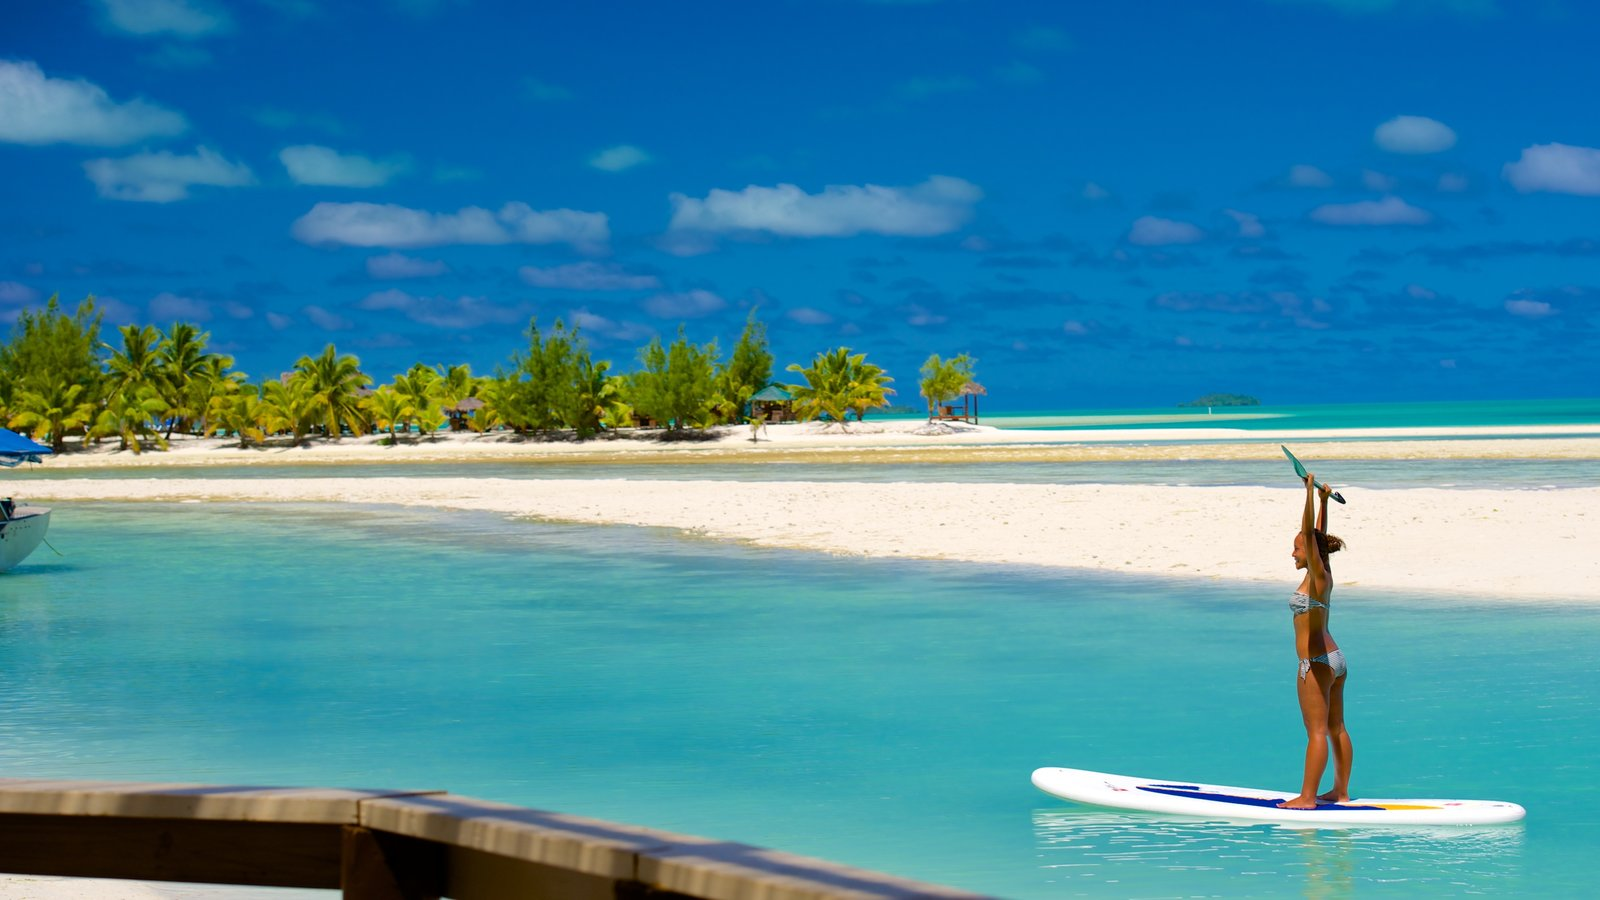 wyspy cooka - cook islands